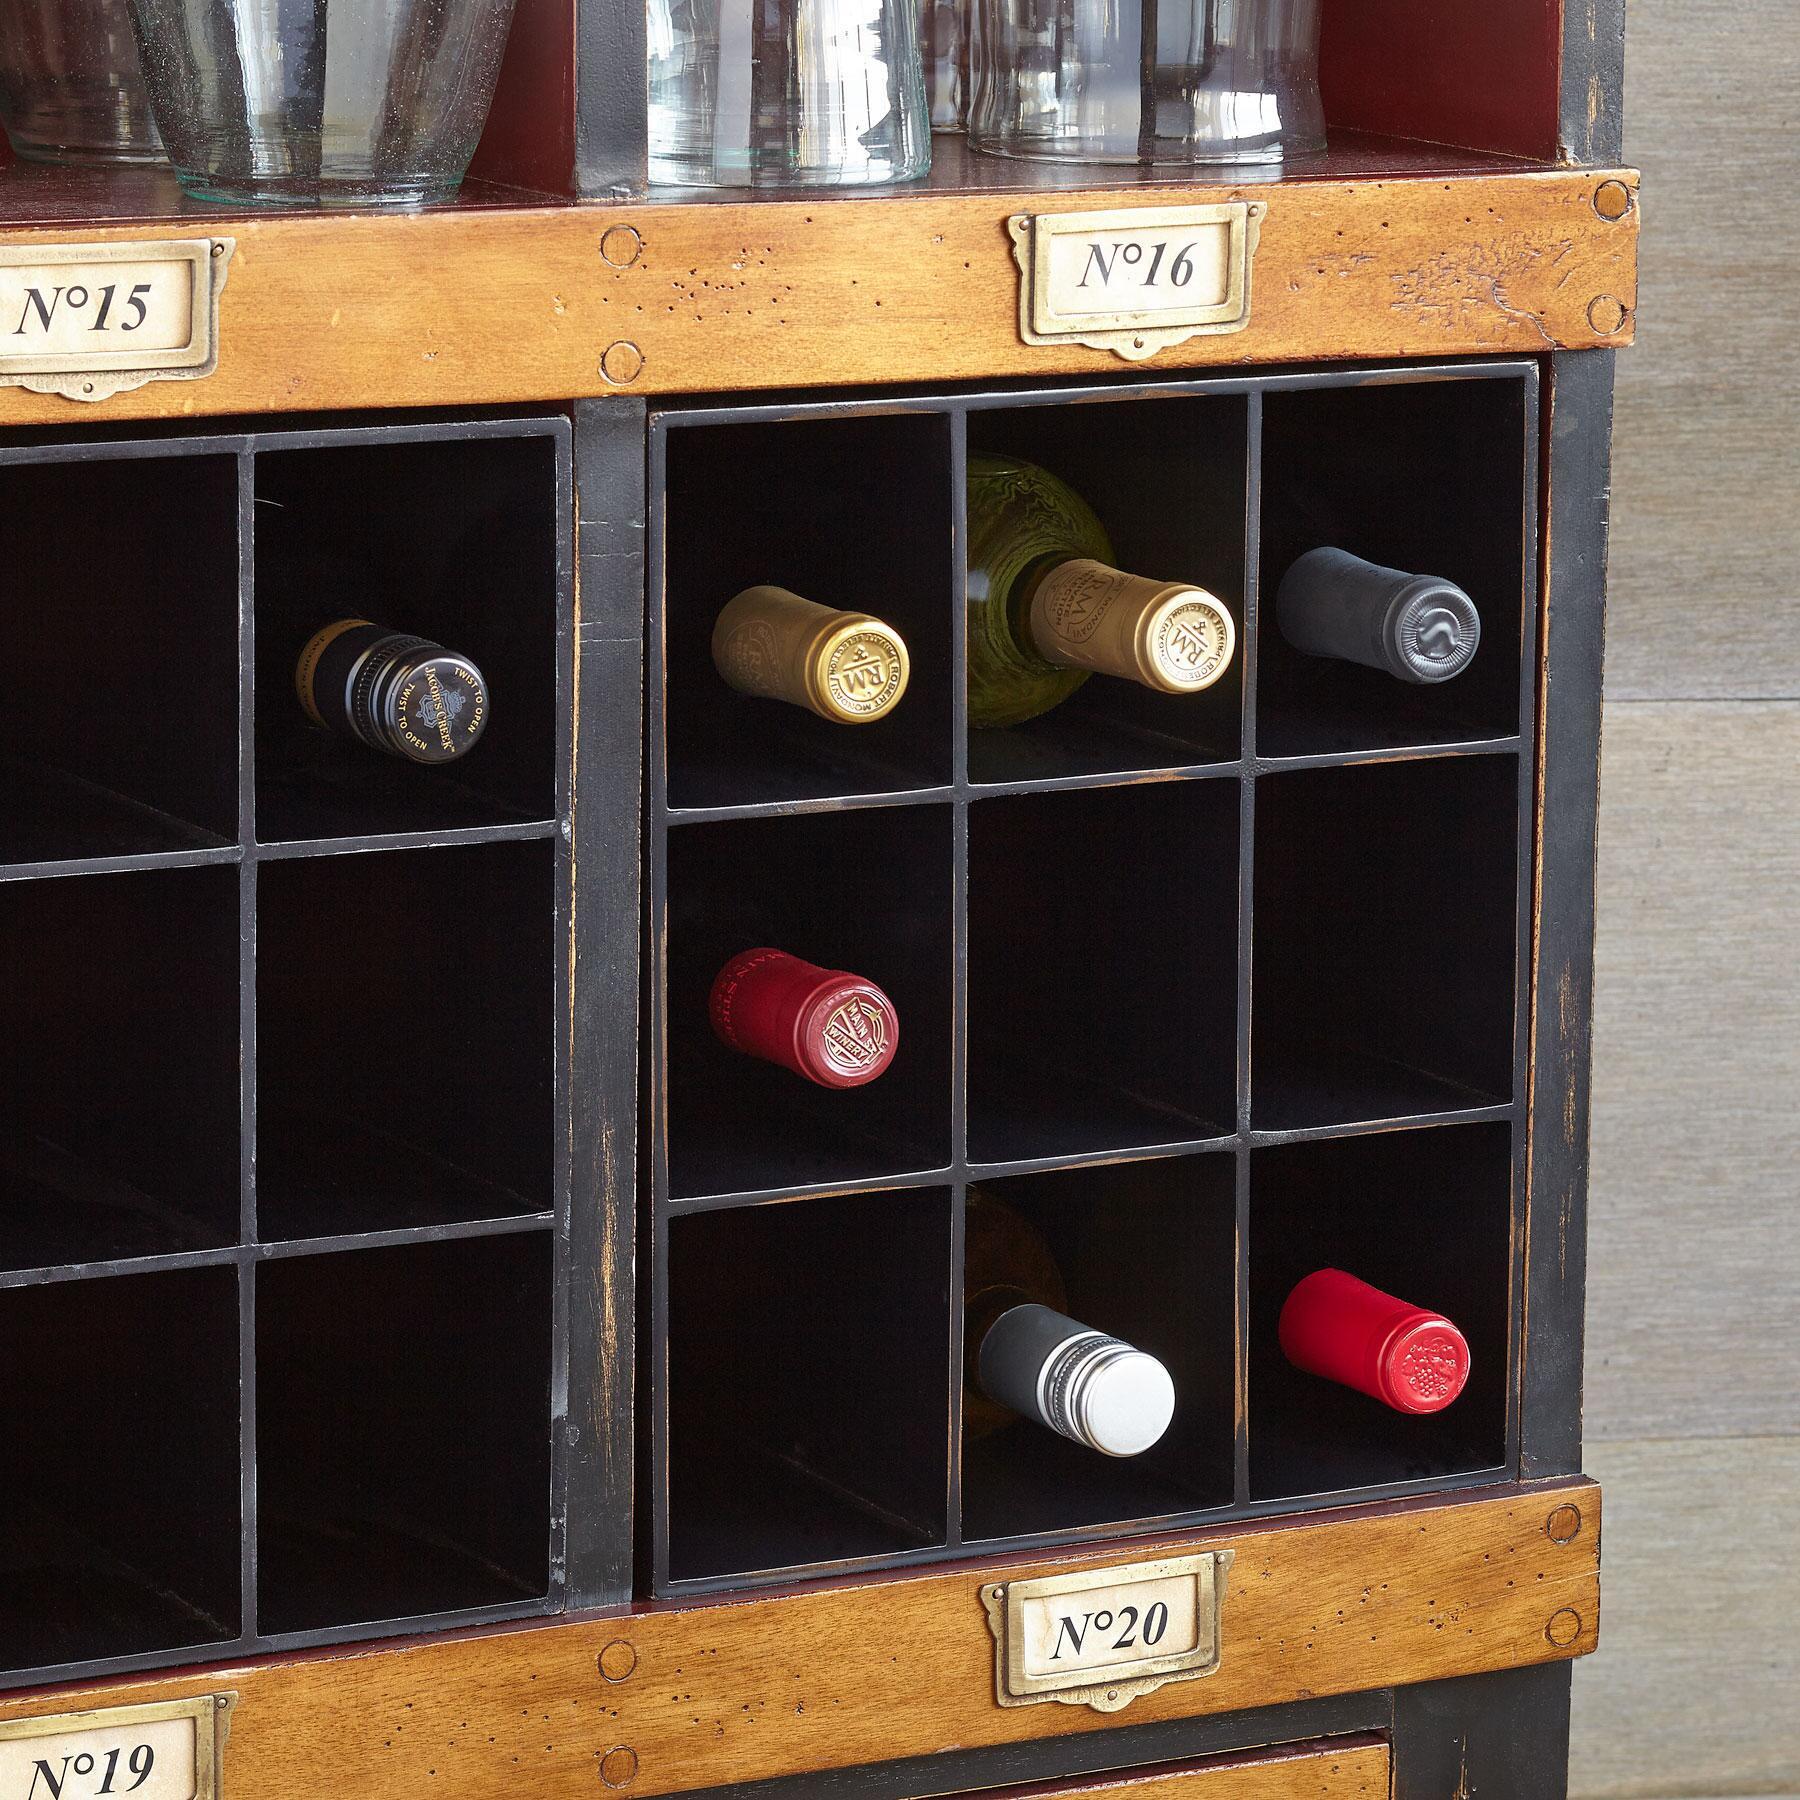 DRAPER WINE CRATE: View 1